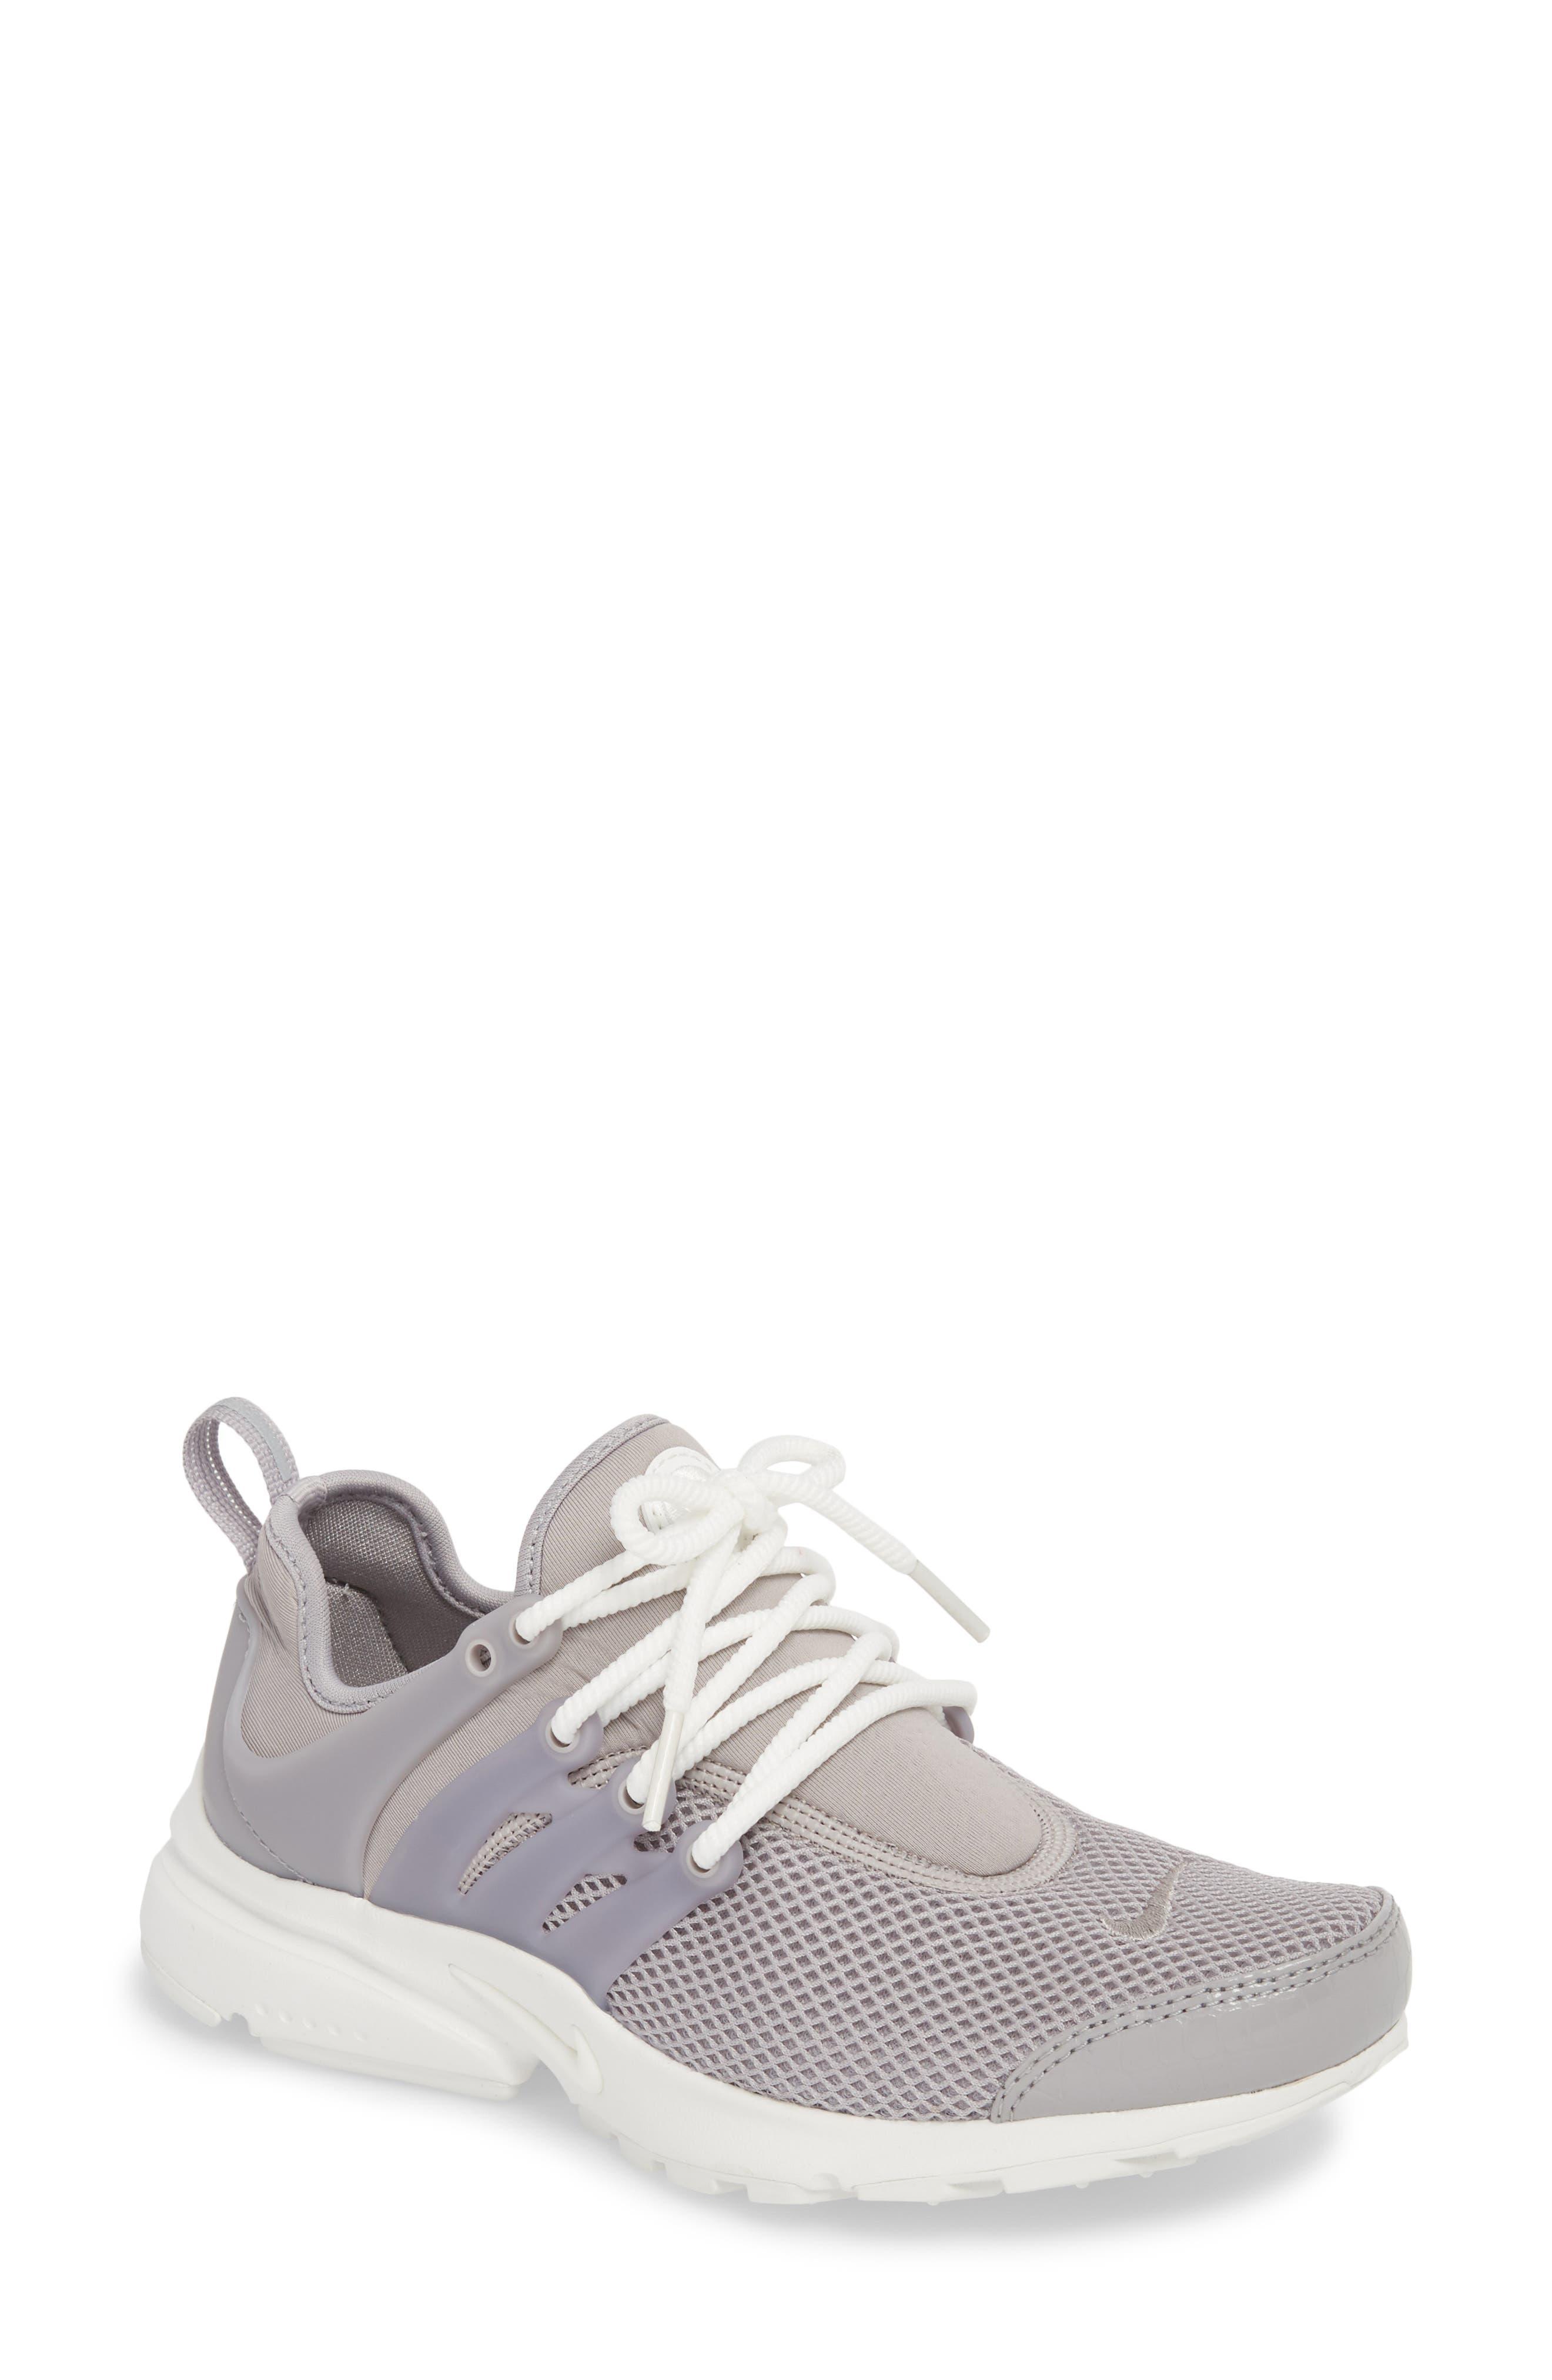 Air Presto SE Sneaker,                         Main,                         color, 021